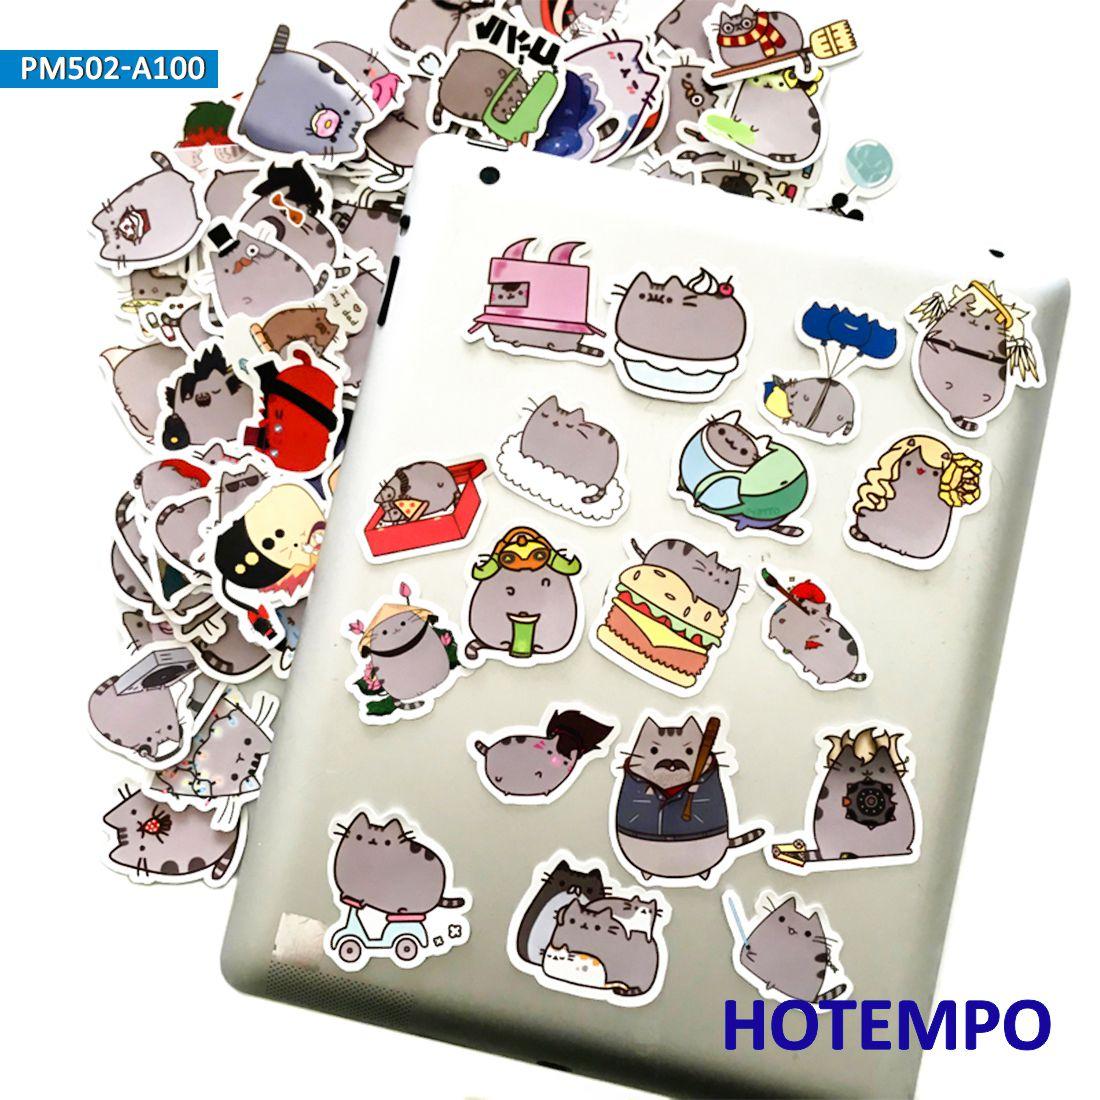 100pcs Cartoon Fat Cat Emoji Cute Stickers For Kids DIY Mobile Phone Laptop Luggage Guitar Case Skateboard Bike Decal Stickers